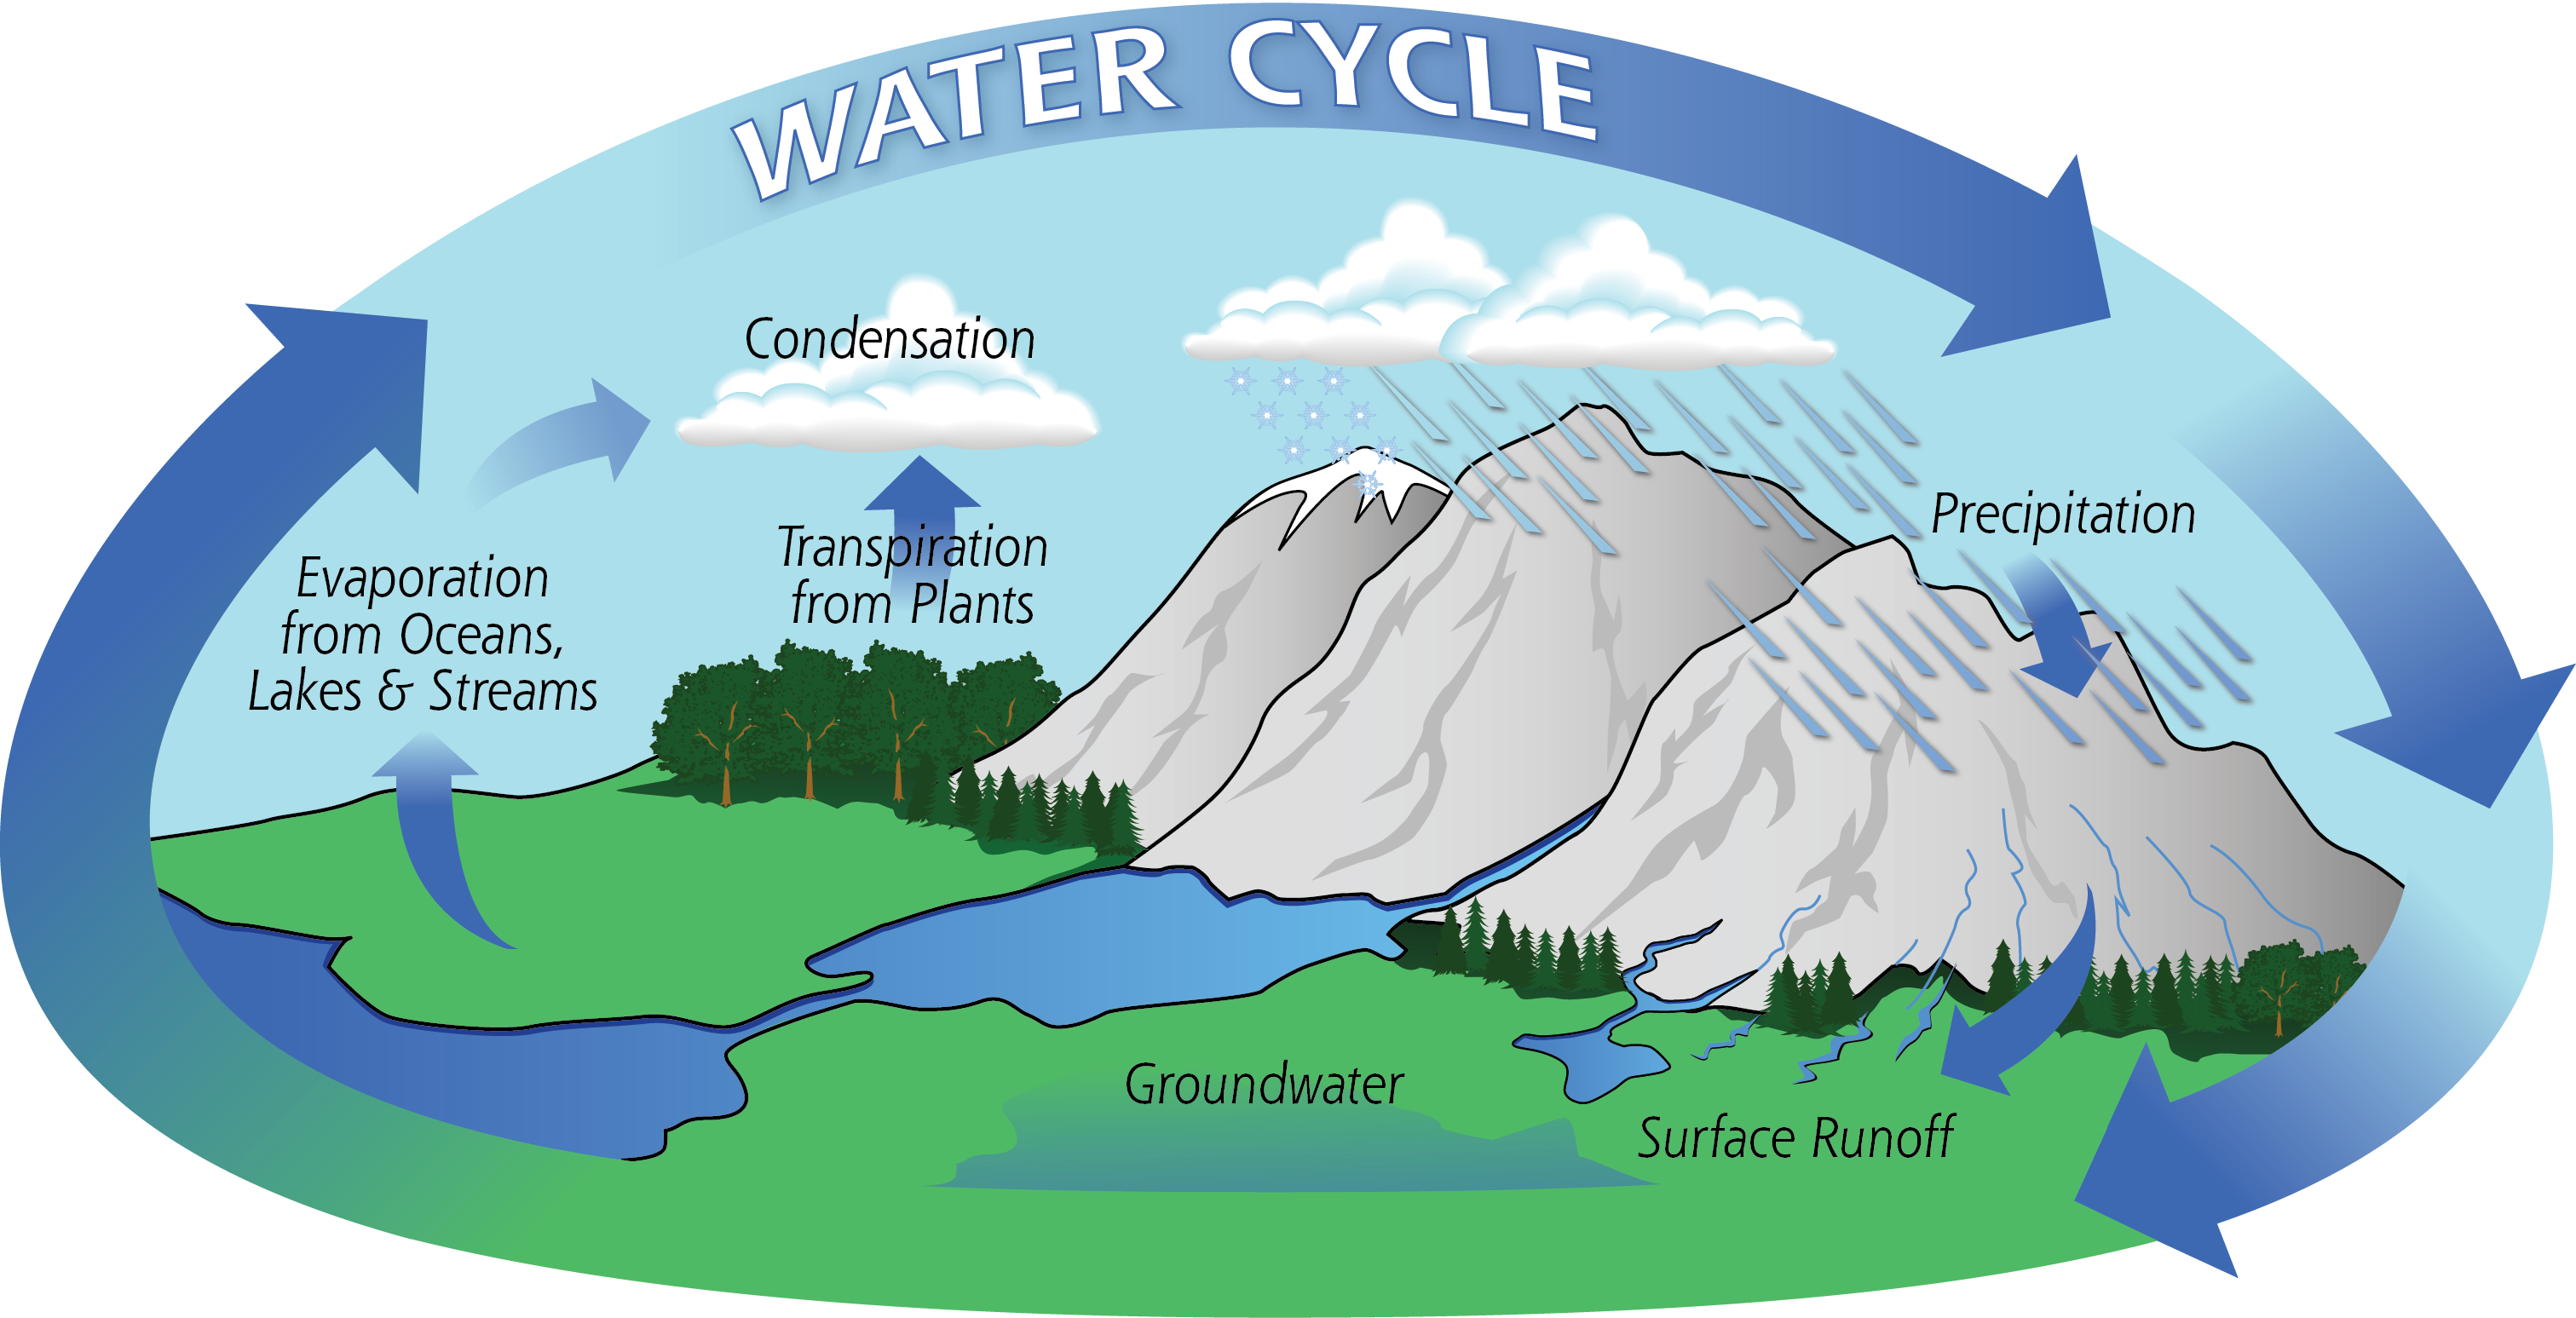 Water    Cycle      Flickr  Photo Sharing